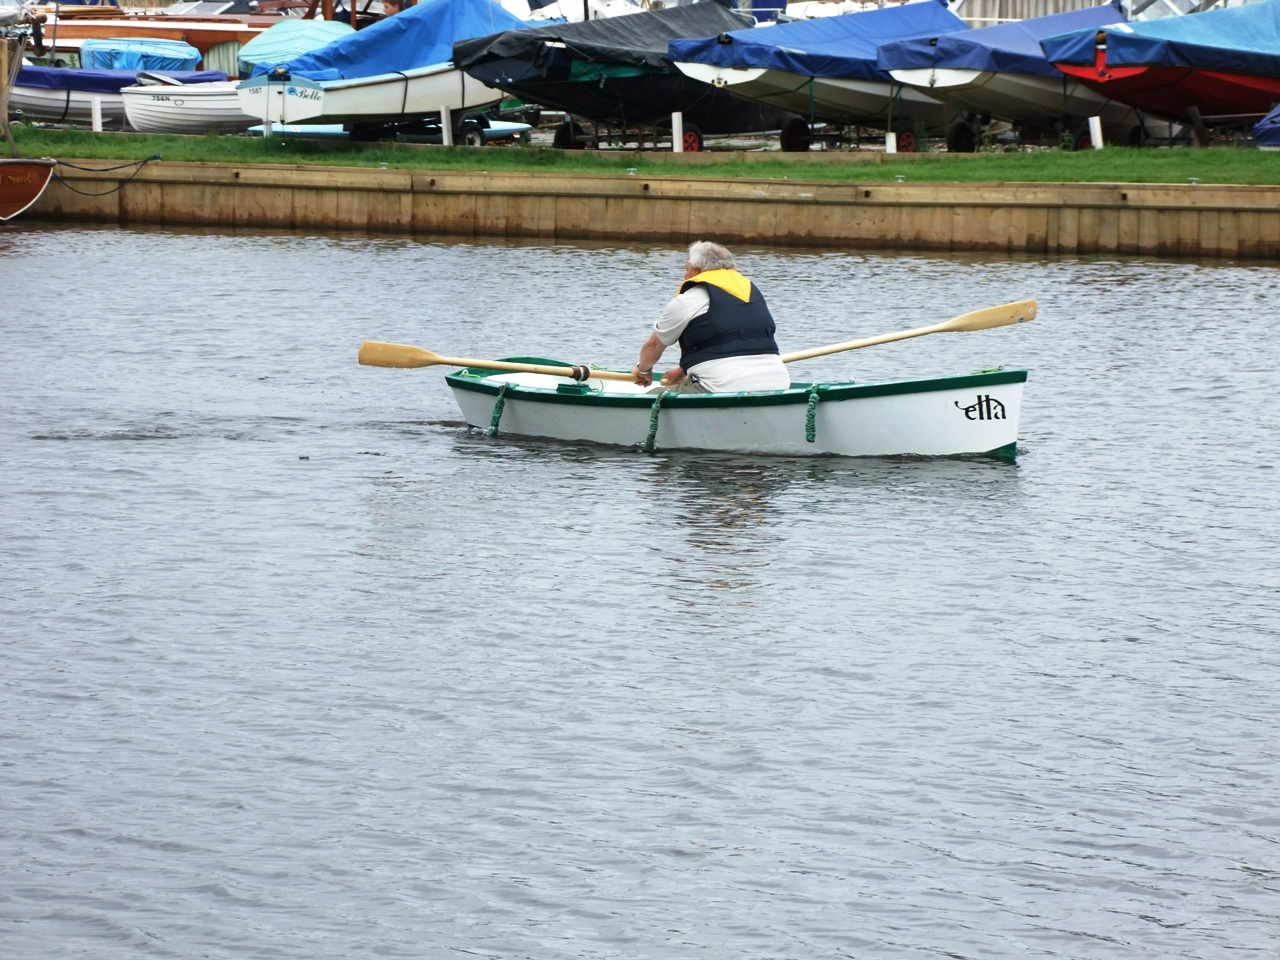 ella skiff, norman fuller, electric boat, electric skiff, rowing skiff ...